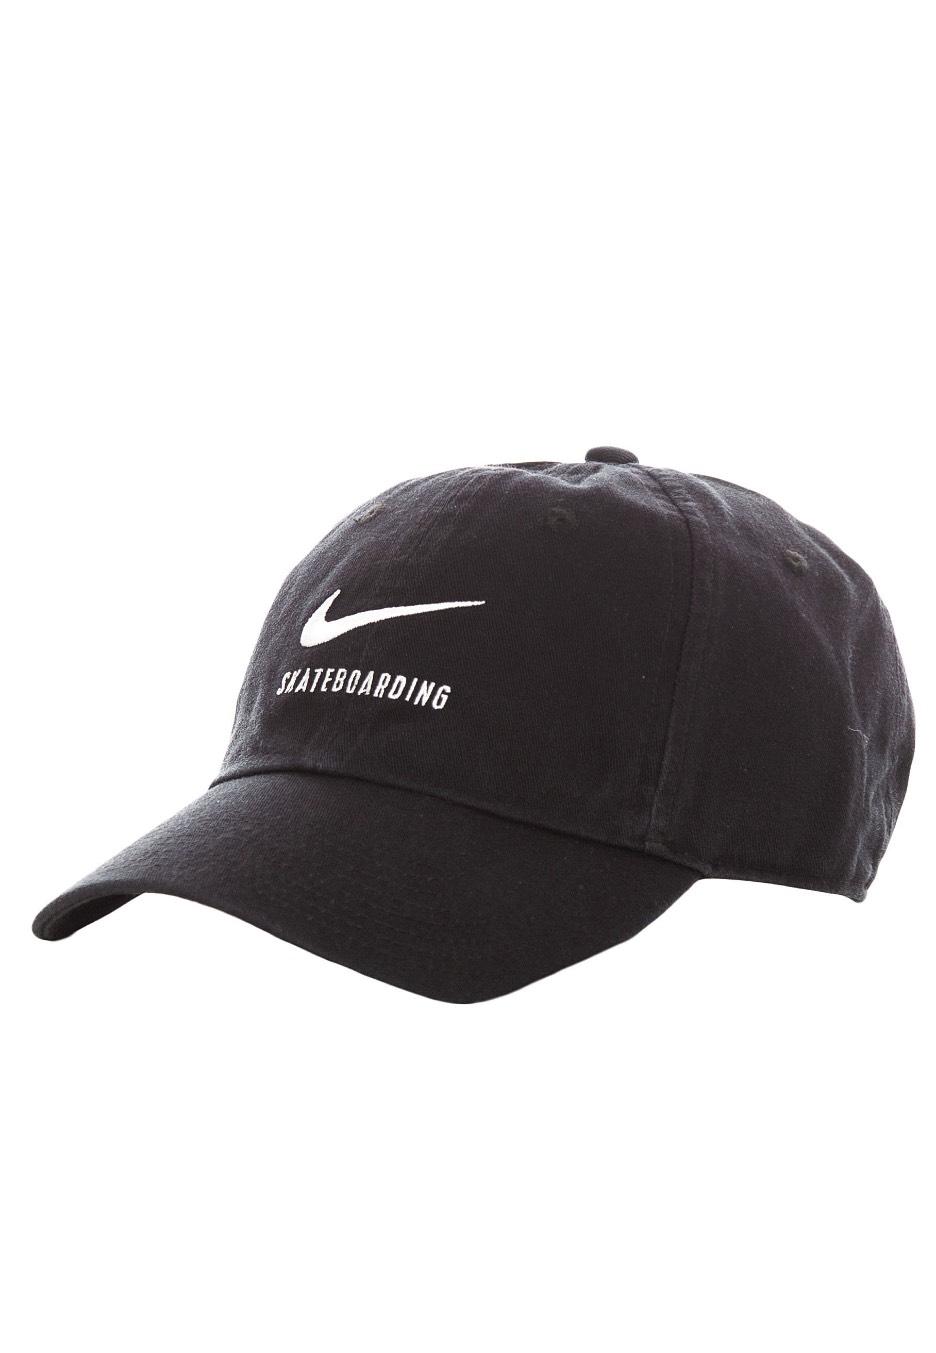 8174144555ee8 Nike - SB H86 Cap Black Black White - Cap - Streetwear Shop - Impericon.com  Worldwide